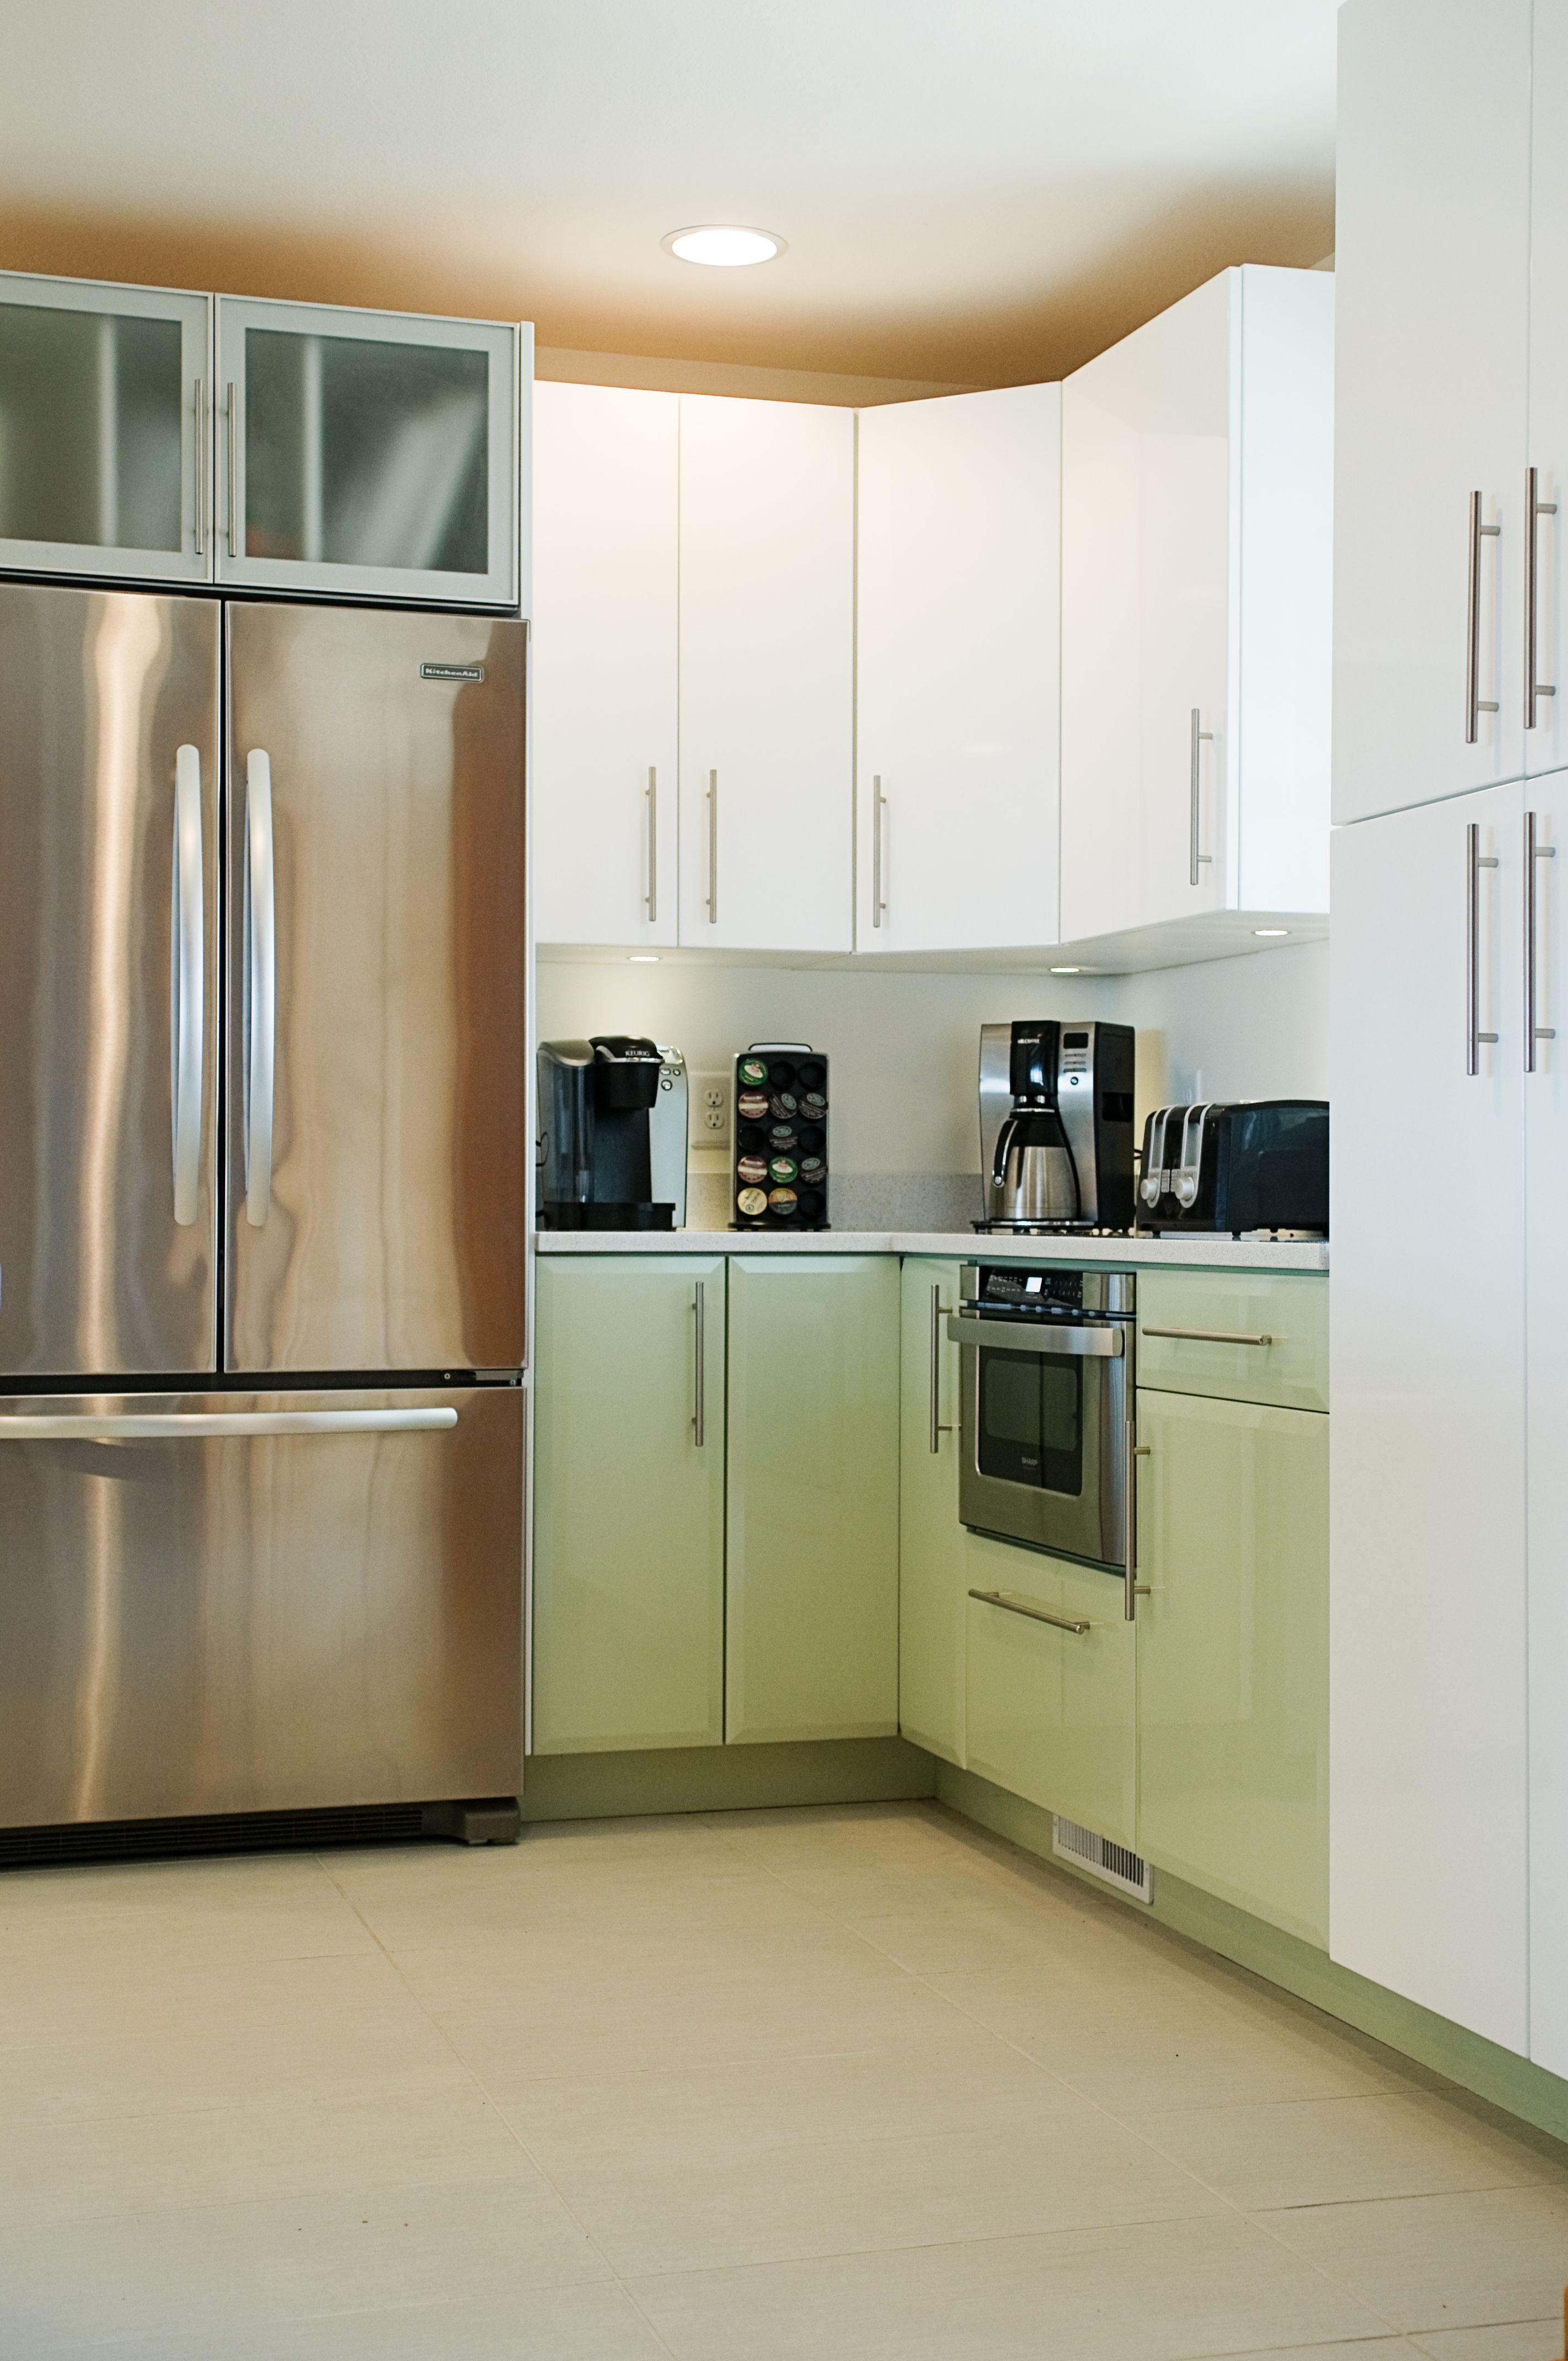 36 kitchenaid refrigerator cozy kitchens group obx nc